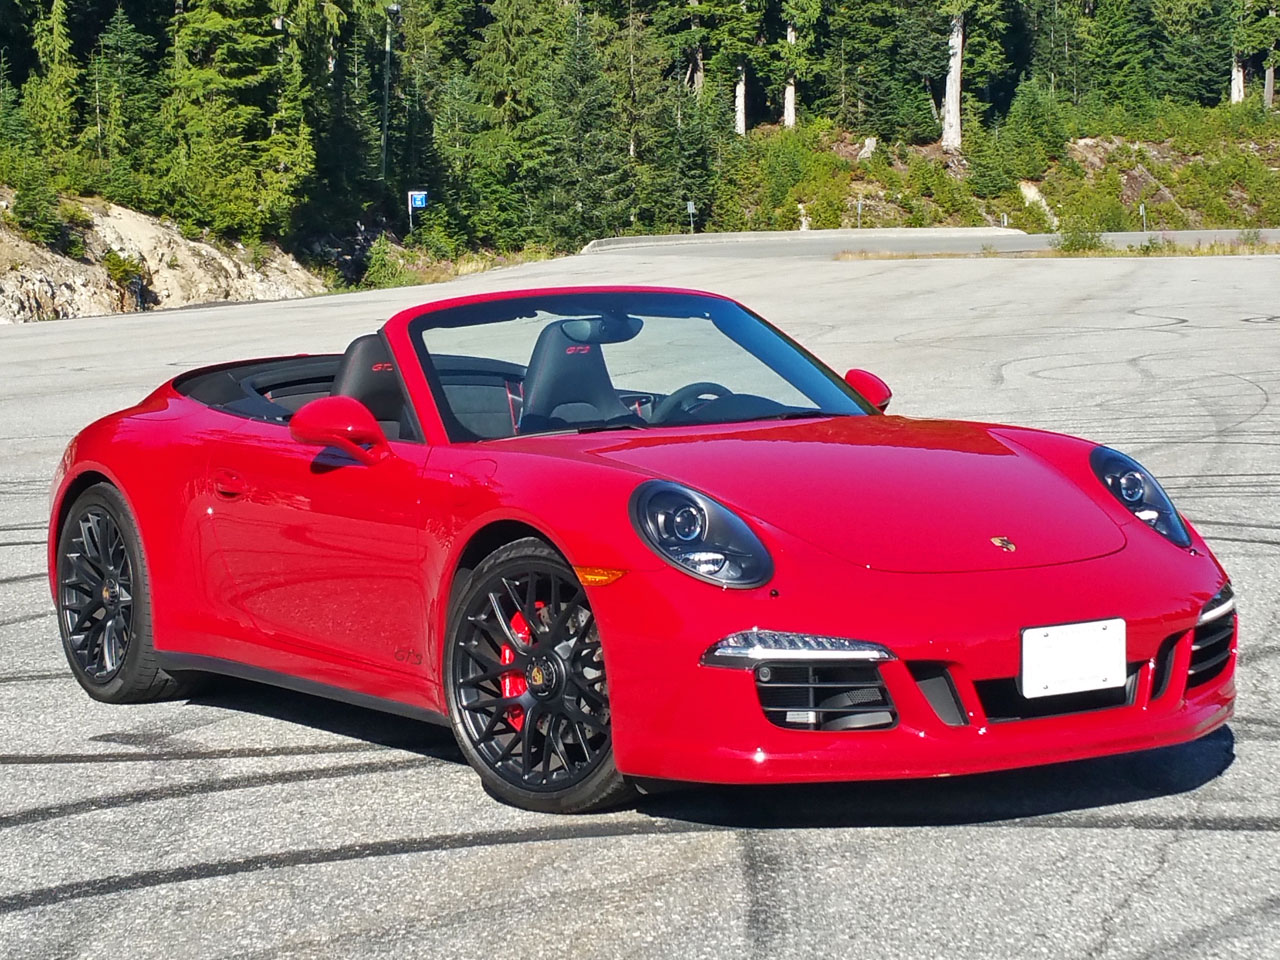 2015 Porsche 911 Carrera 4 Gts Cabriolet Road Test Review